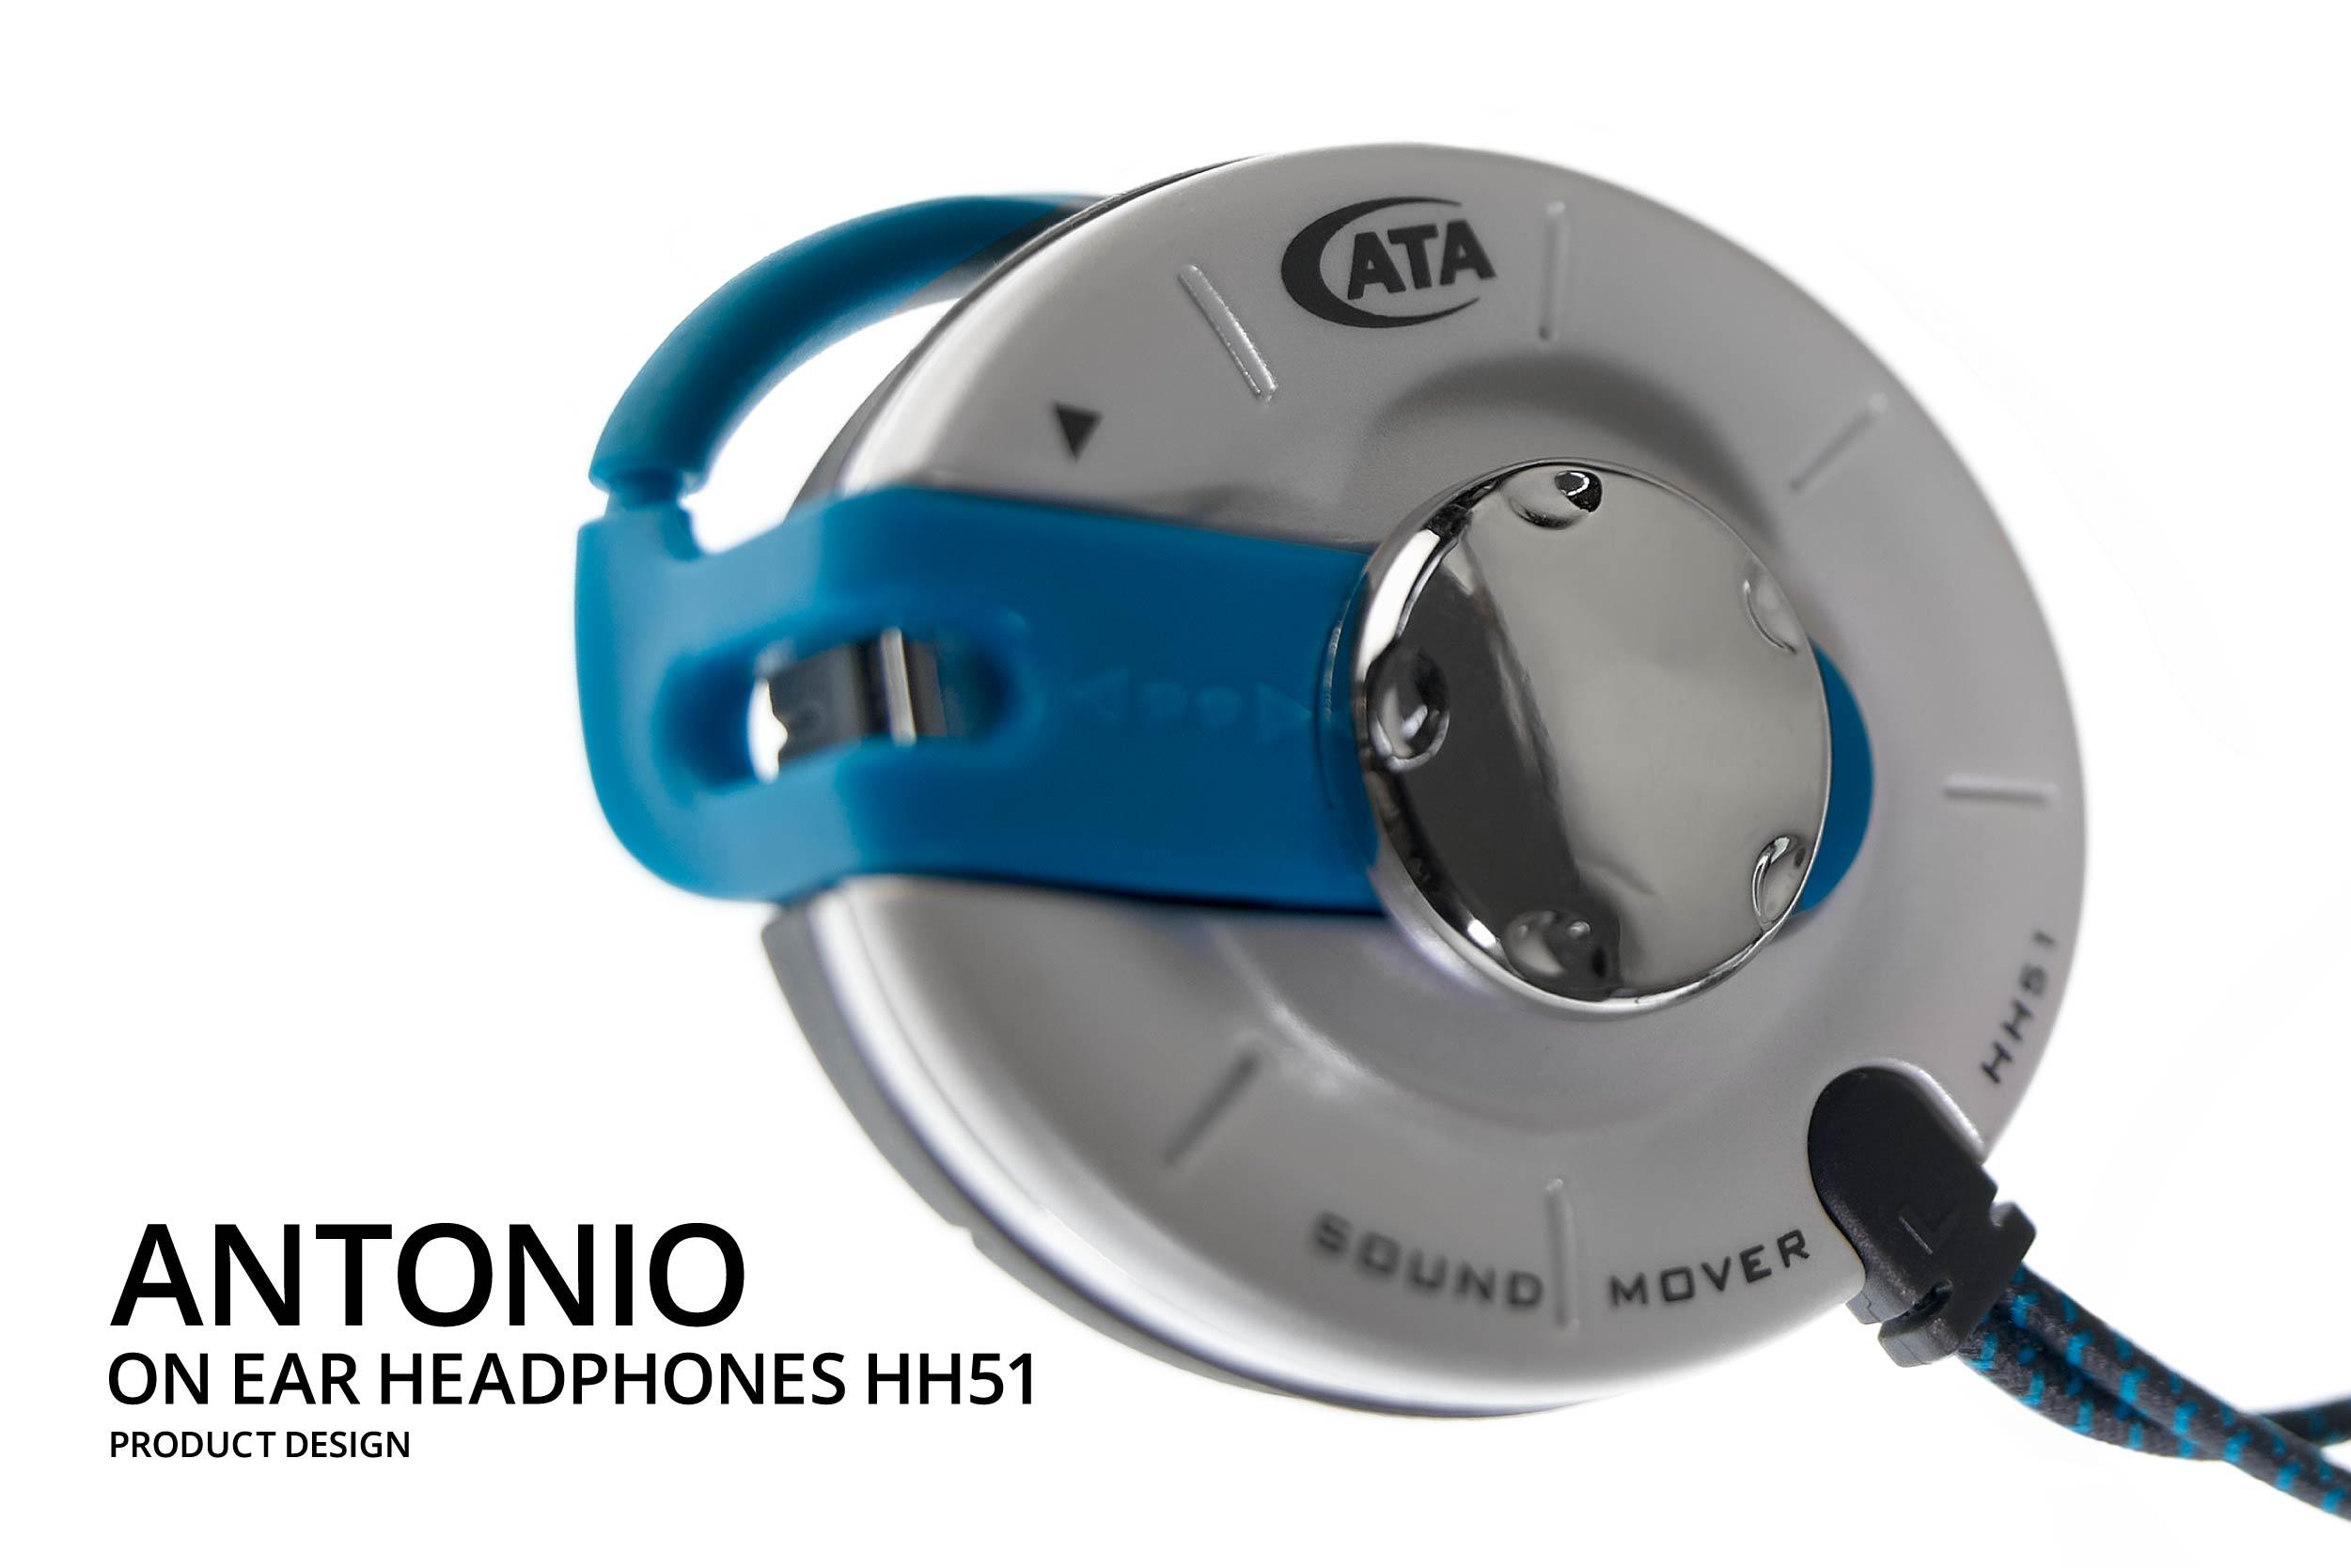 ANTONIO-HH51-1